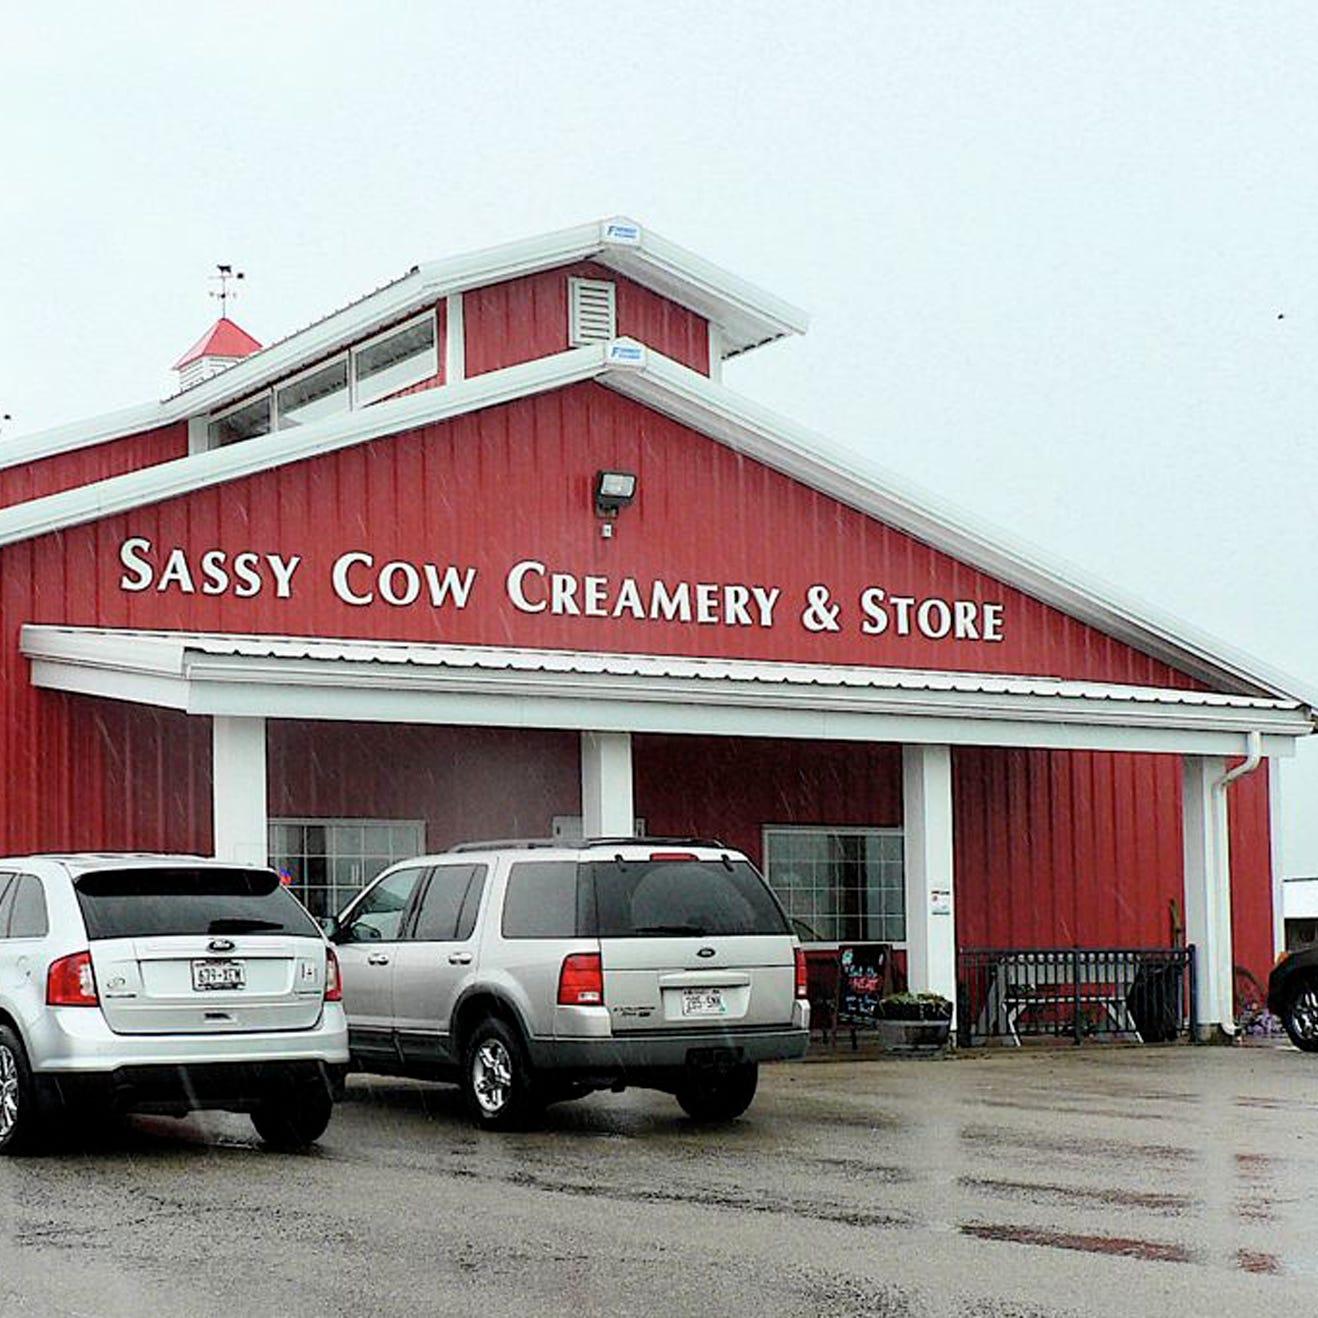 Sassy Cow Creamery: a destination